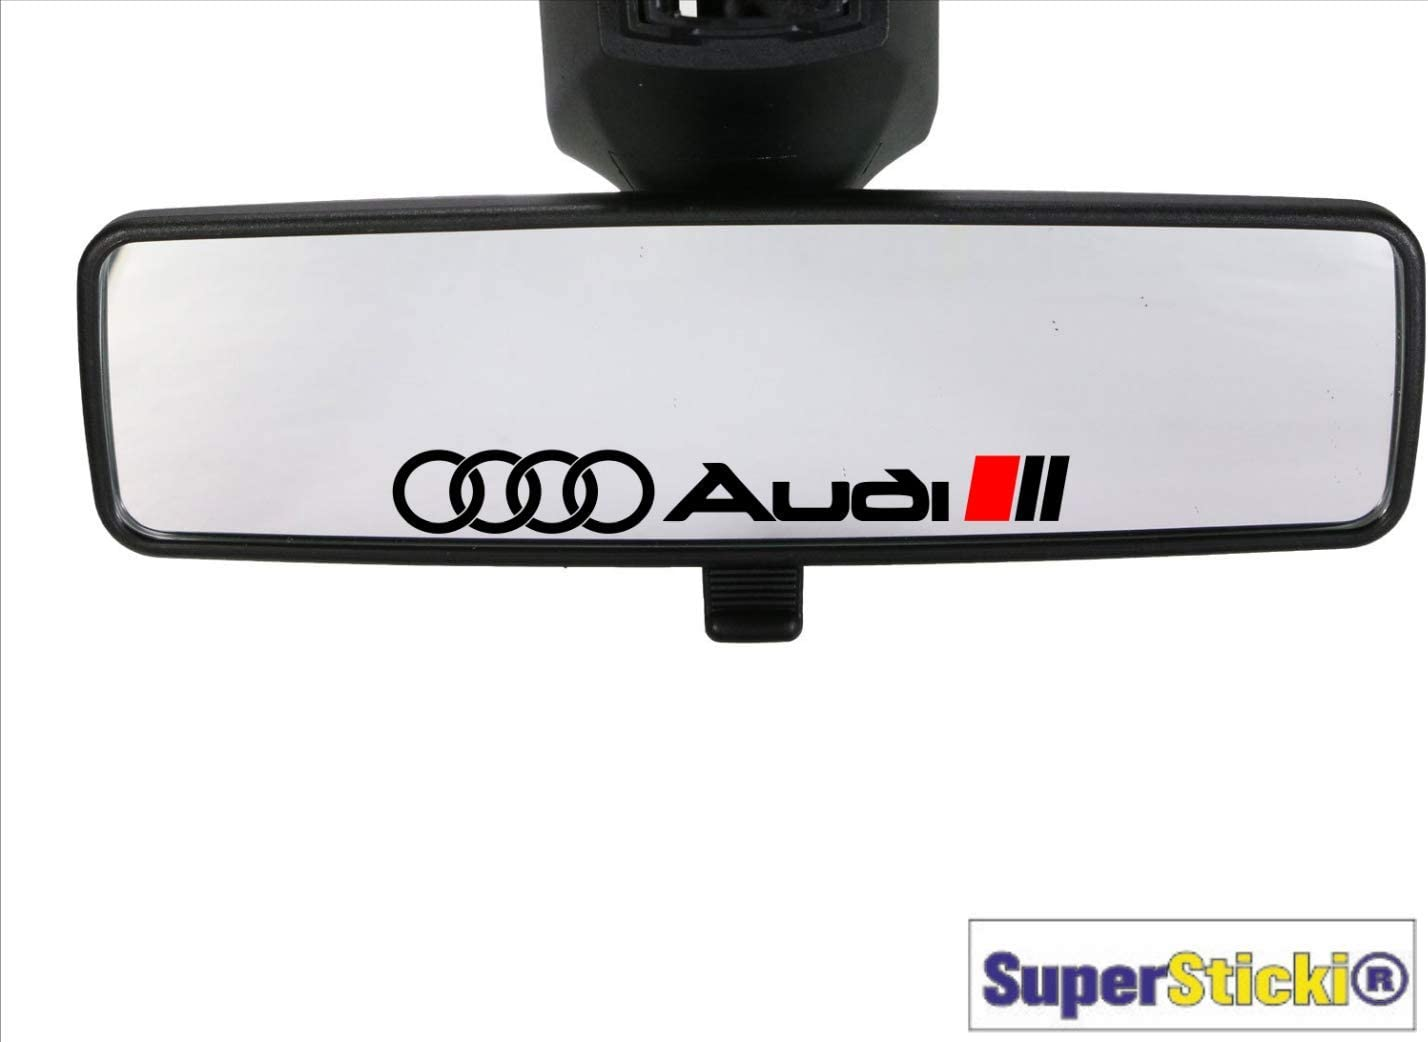 SUPERSTICKI 2 x Ringe kompatibel f/ür Audi Fahne R/ückspiegelaufkleber Rennsport Racing Tuning Decal Sticker Hobby Aufkleber Decal Sticker aus Hochleistungsfolie